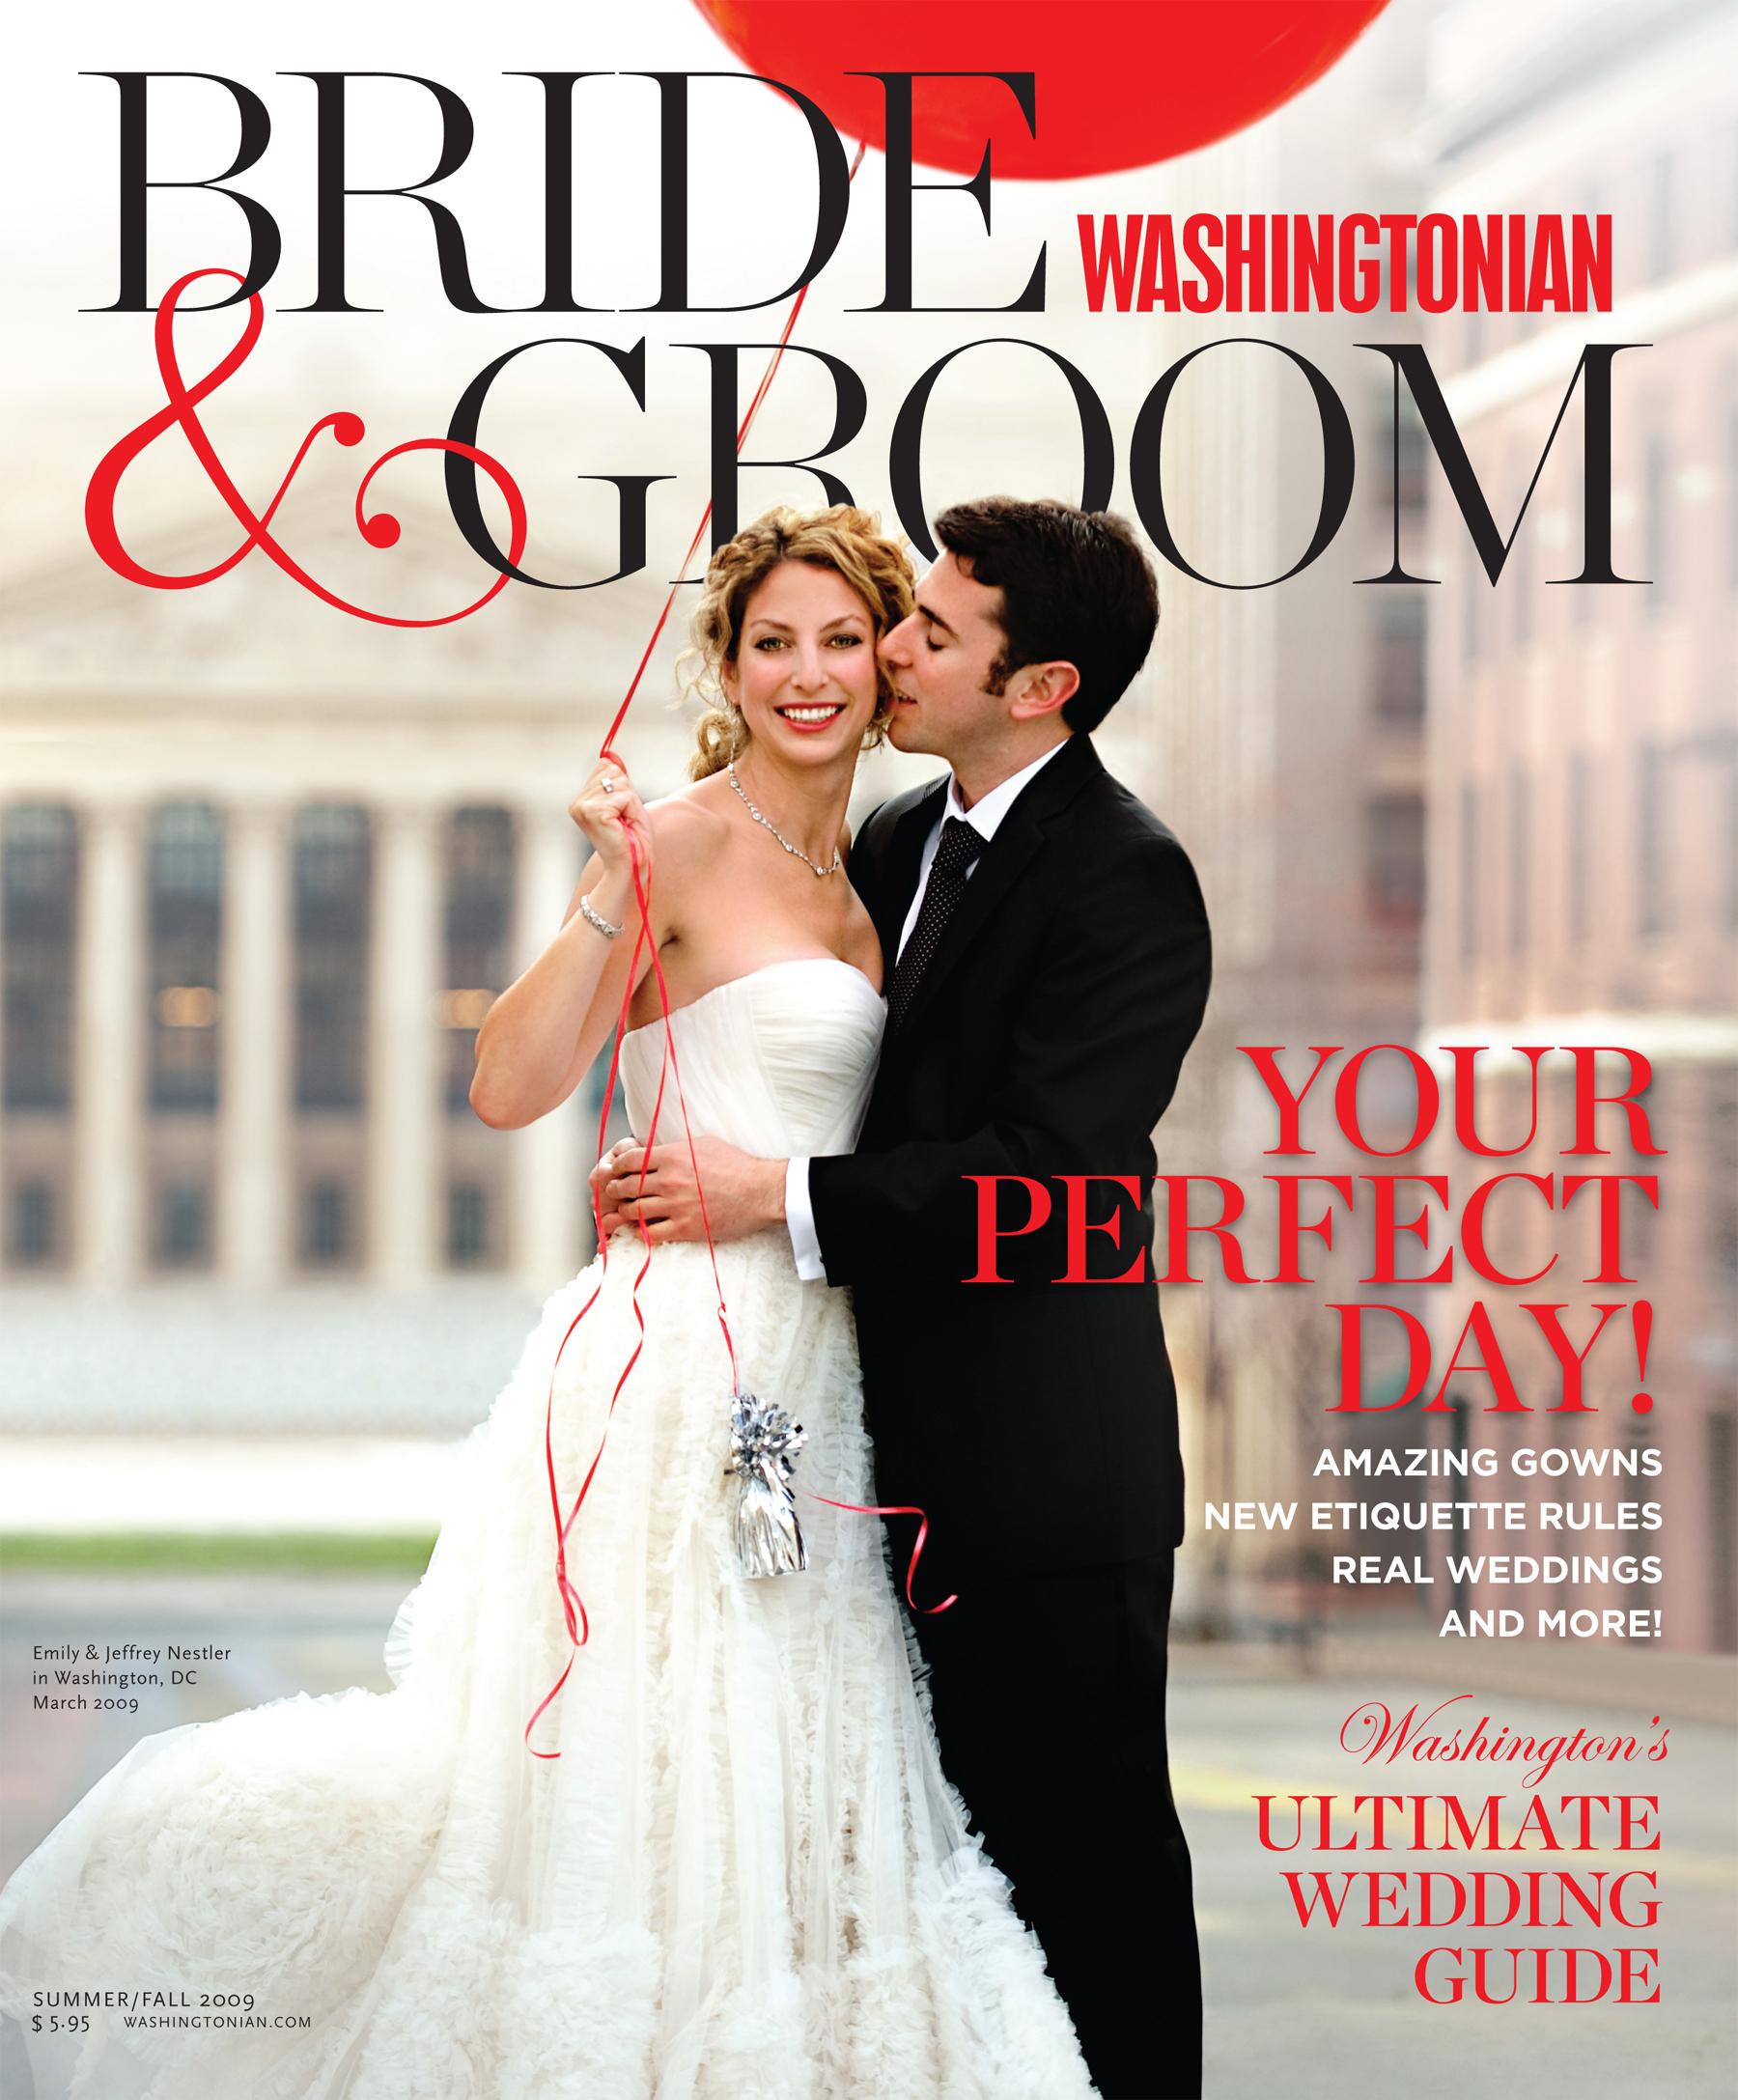 Event Accomplished in Washingtonian Bride and Groom magazine